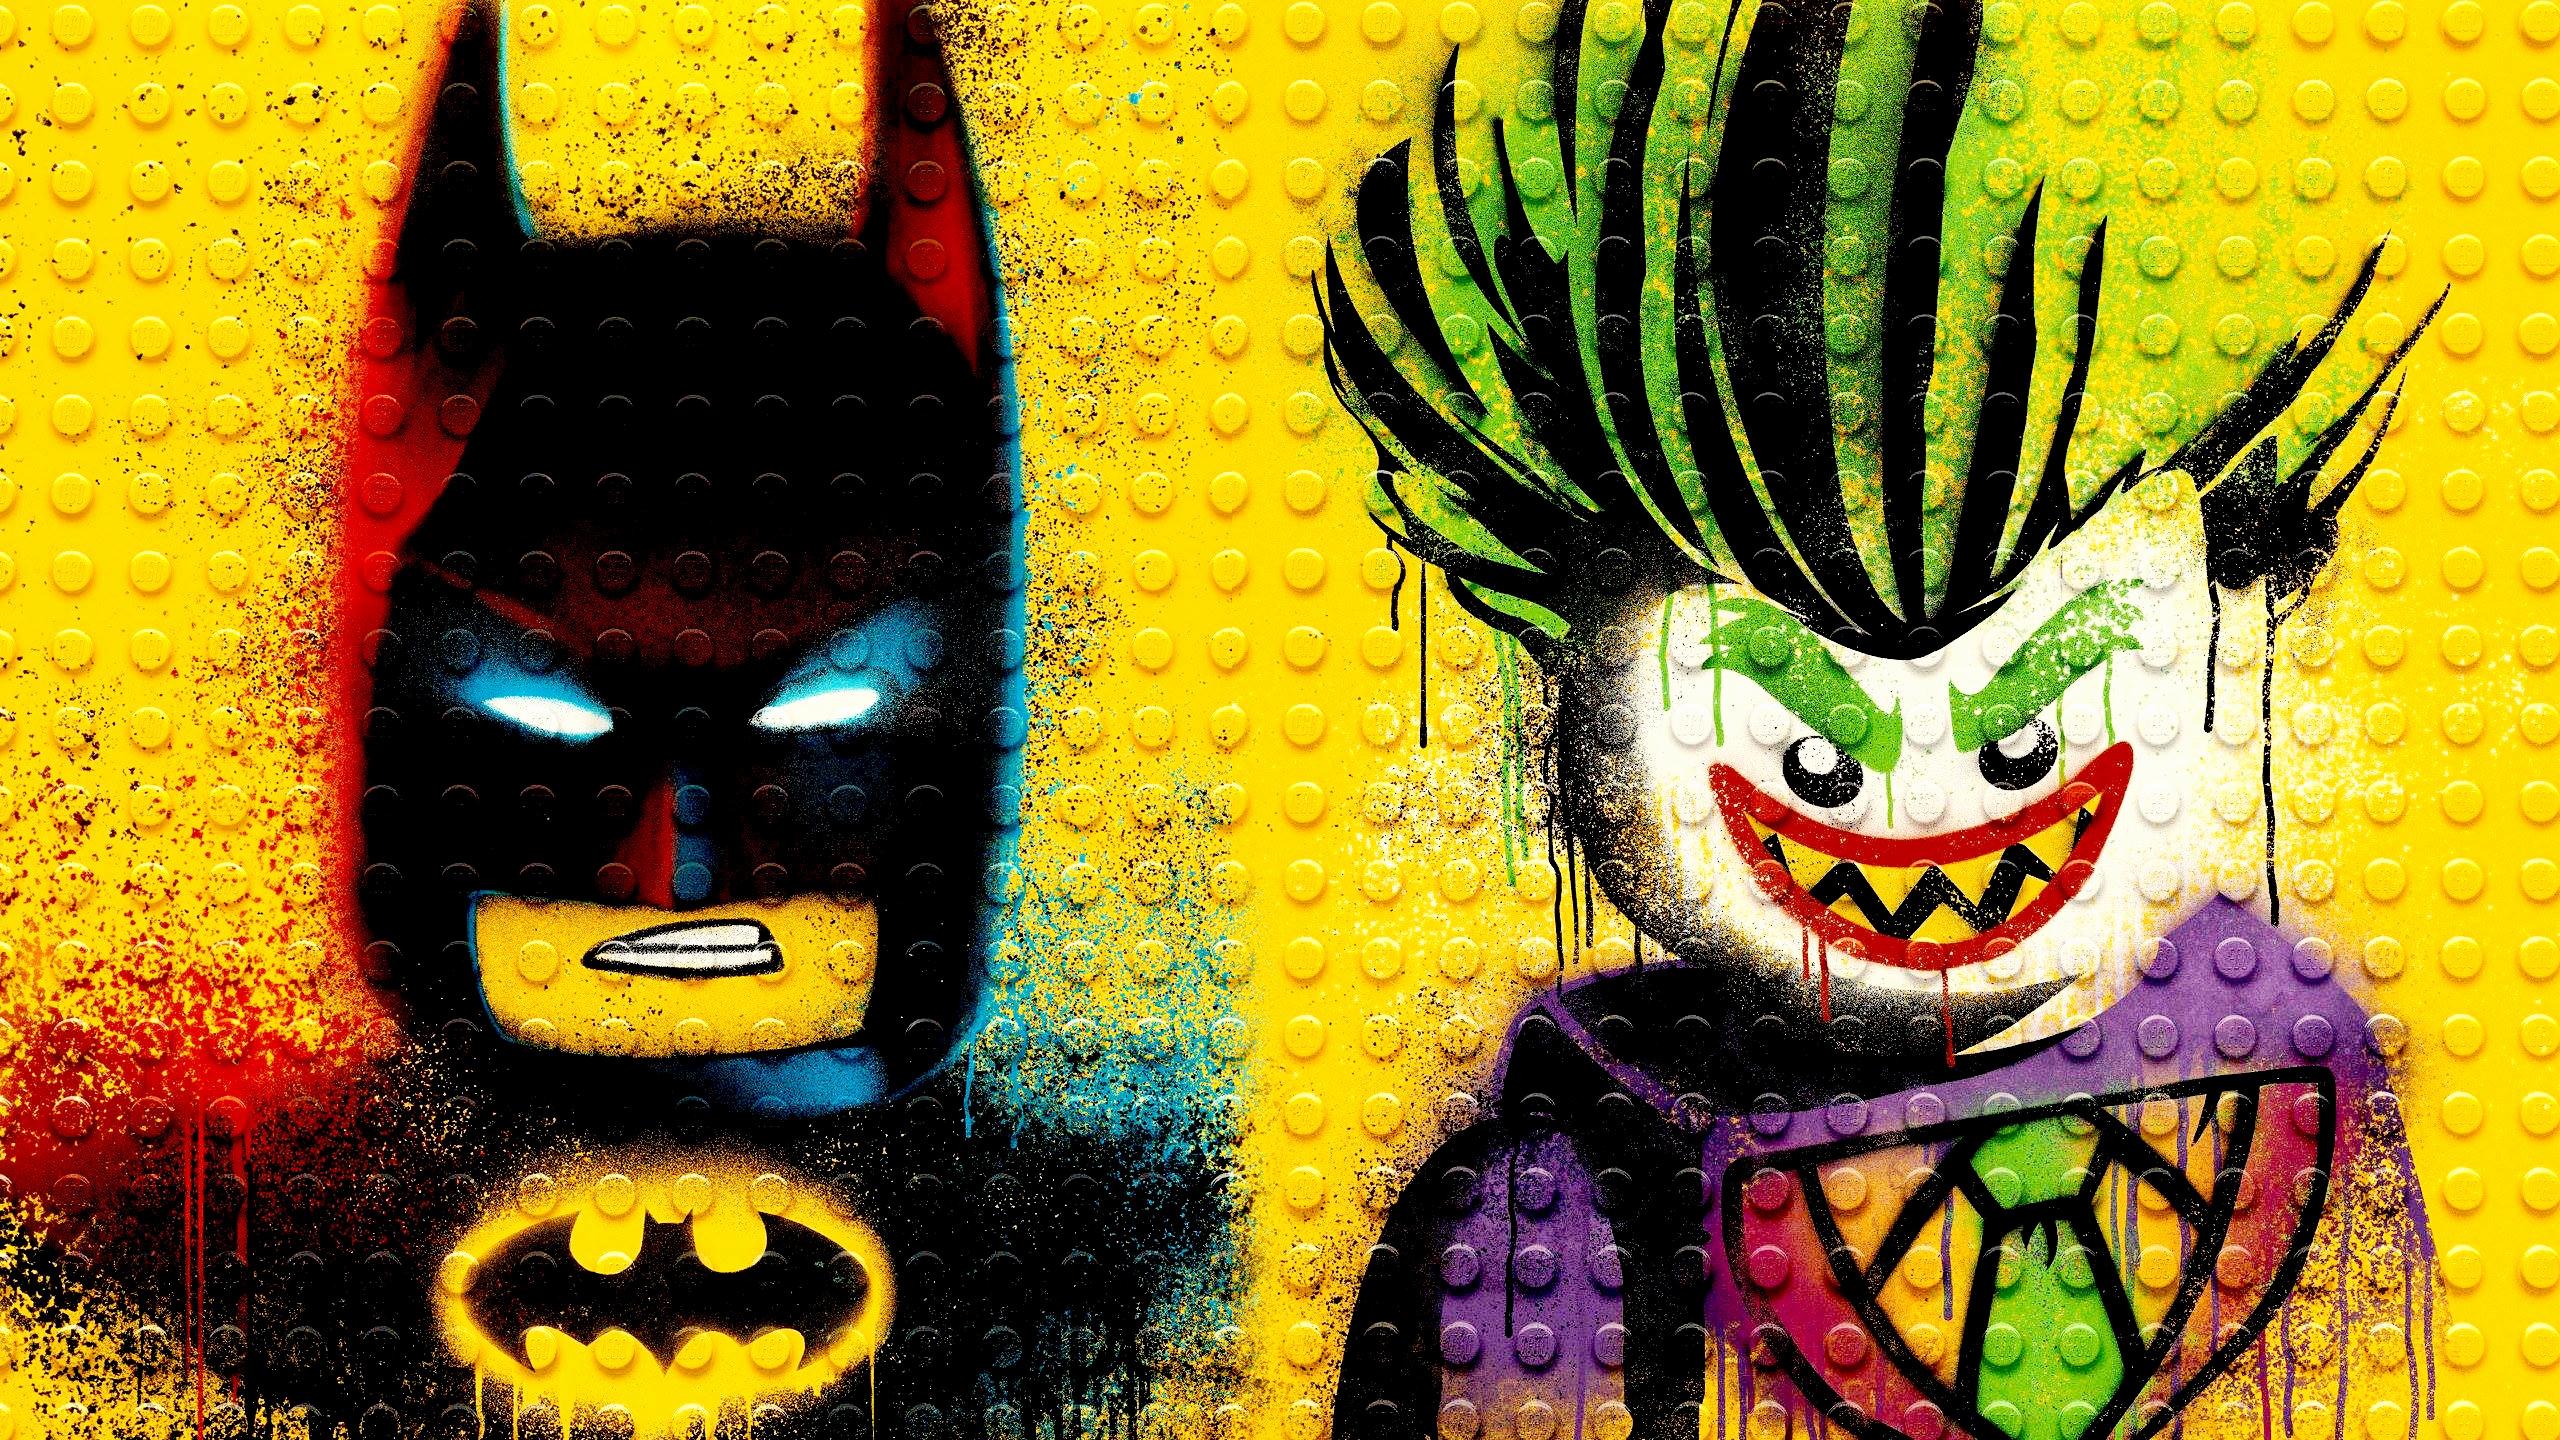 The Lego Batman Wallpaper - Lego Batman Movie , HD Wallpaper & Backgrounds